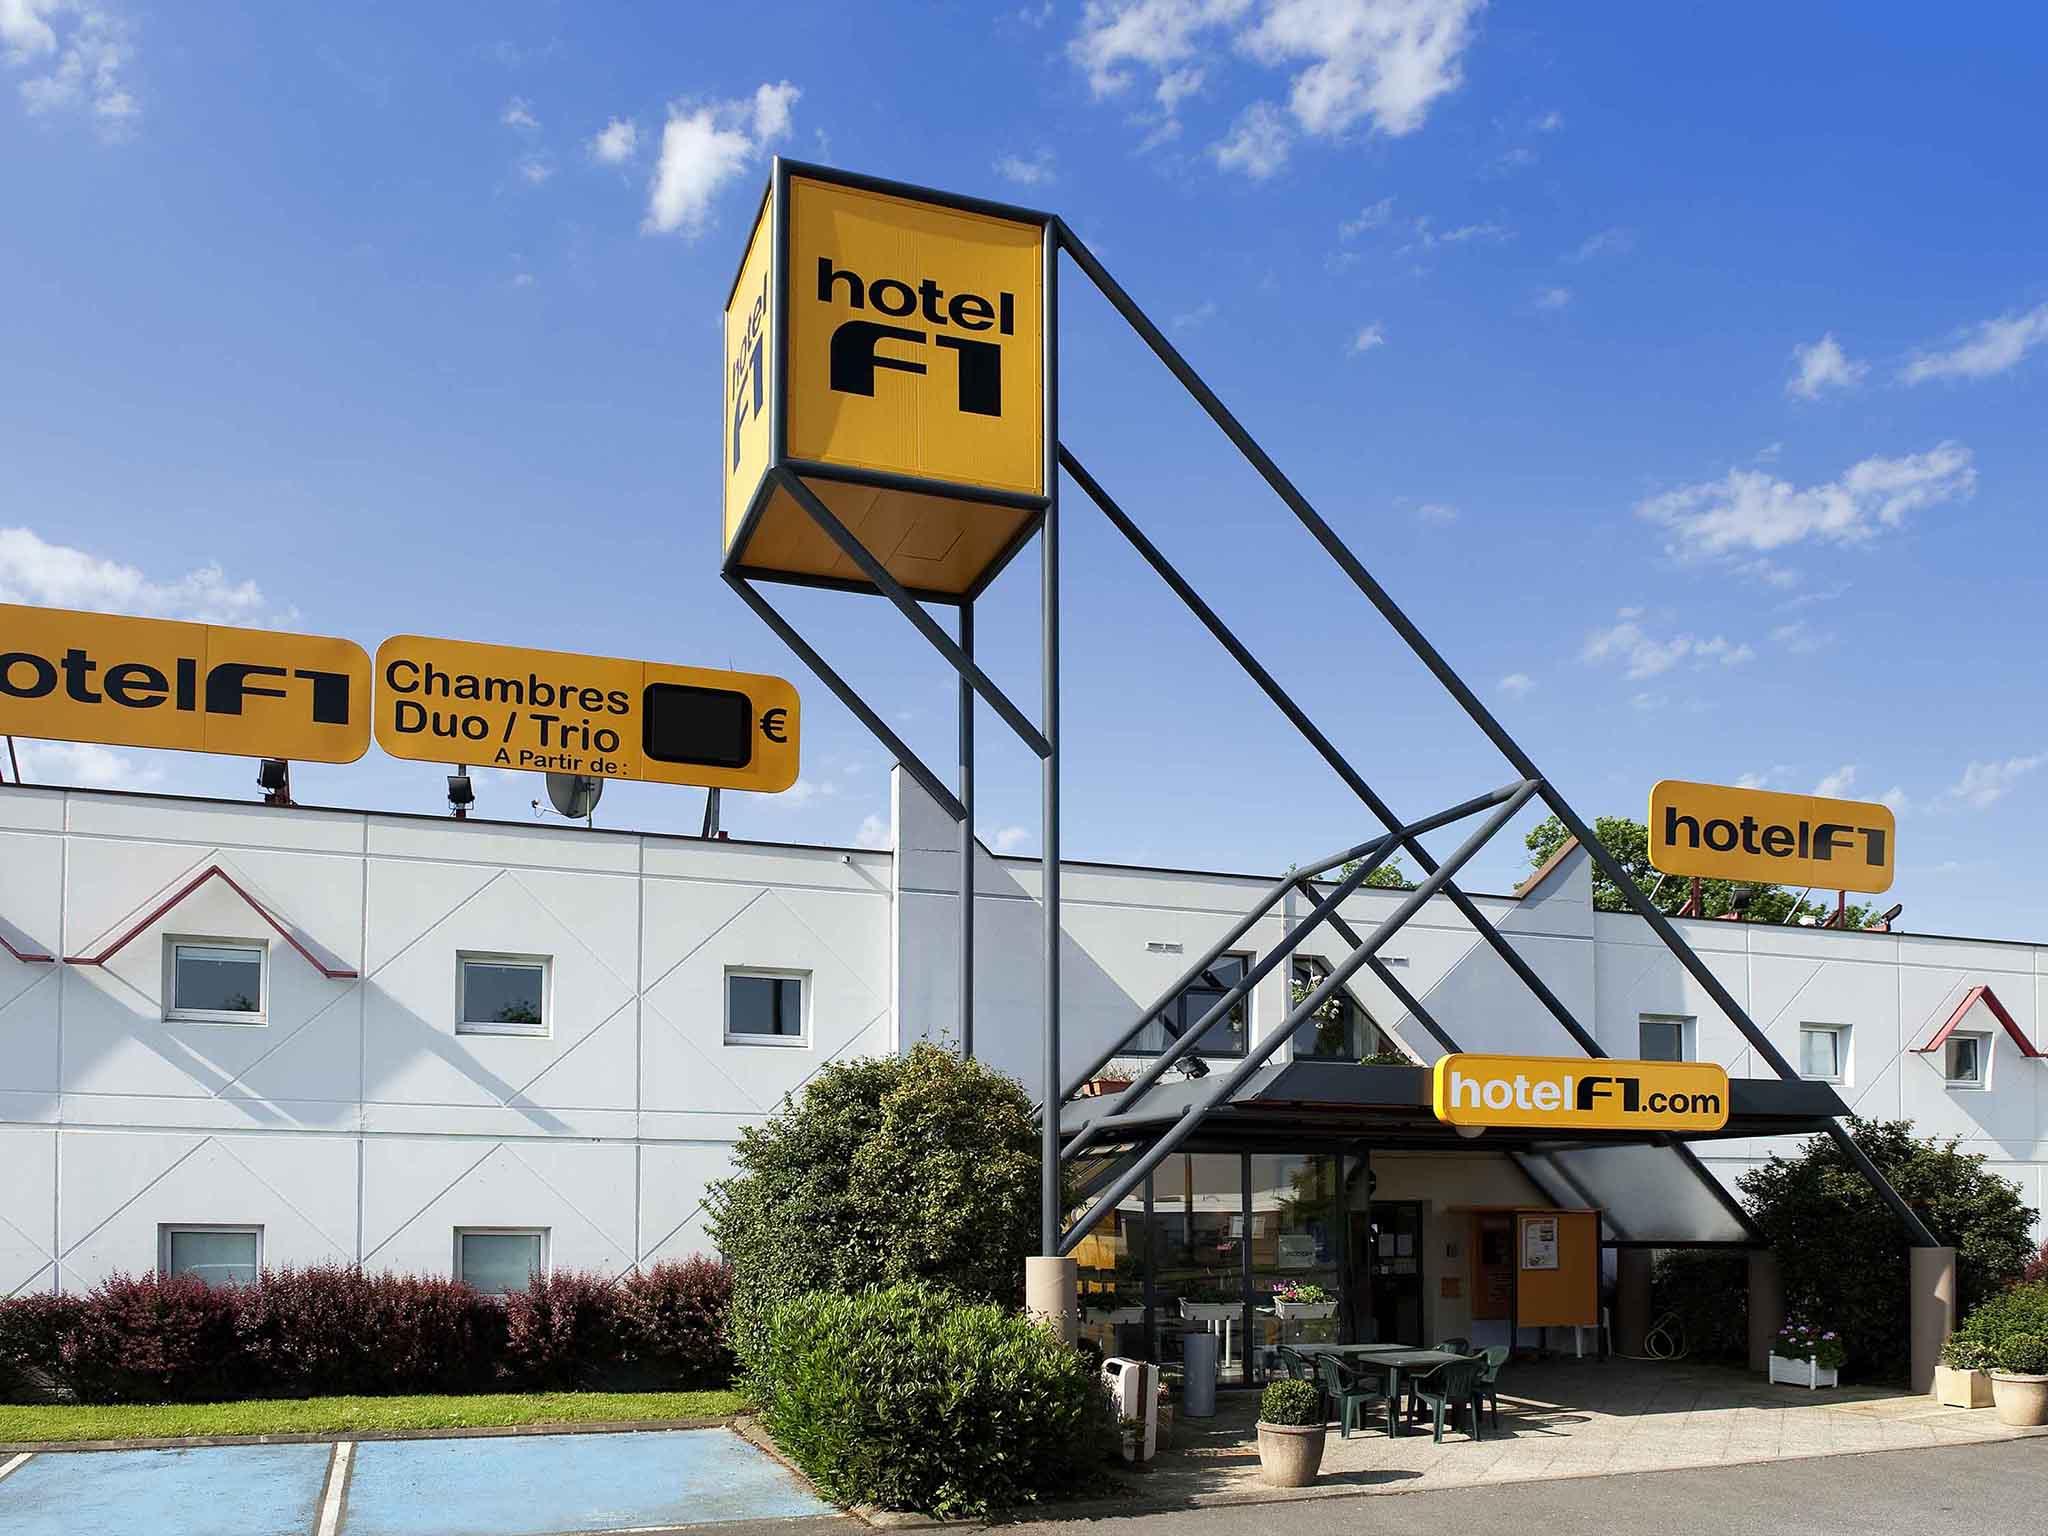 Otel – hotelF1 Remiremont Saint-Nabord